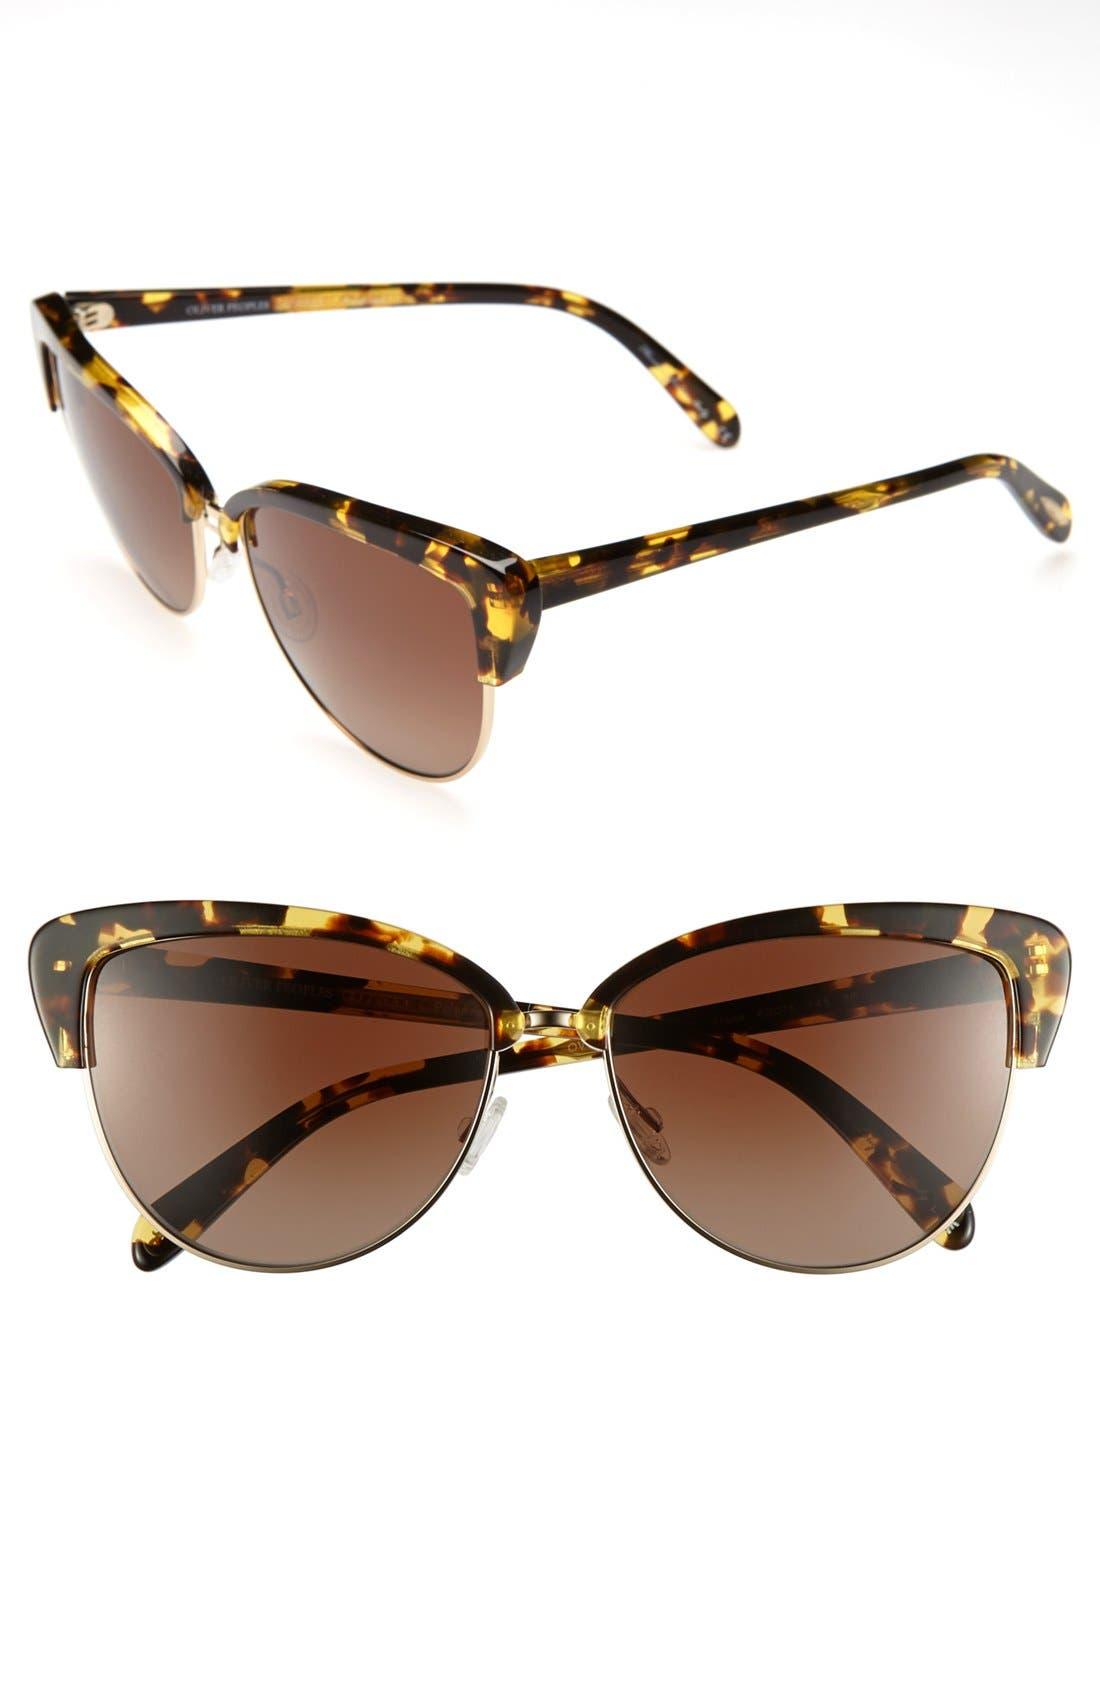 Main Image - Oliver Peoples 'Alisha' 60mm Polarized Sunglasses